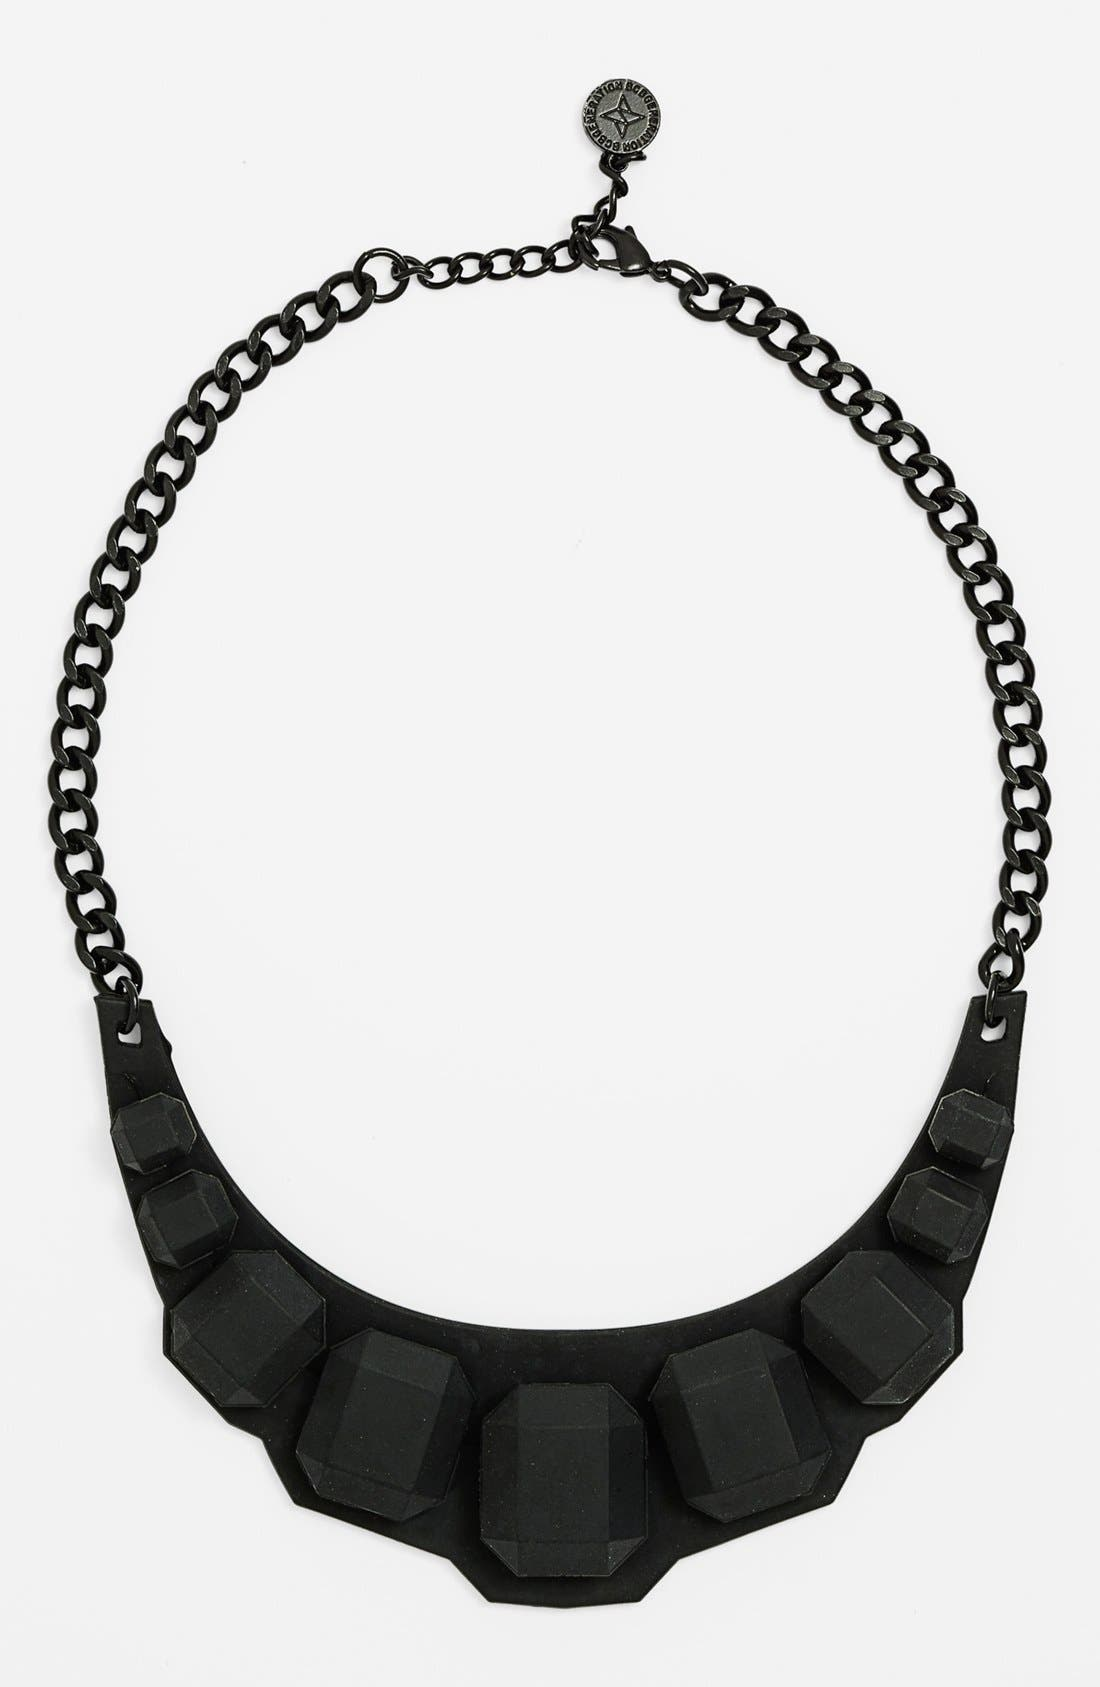 Alternate Image 1 Selected - BCBGeneration 'Rubber Rock' Short Necklace